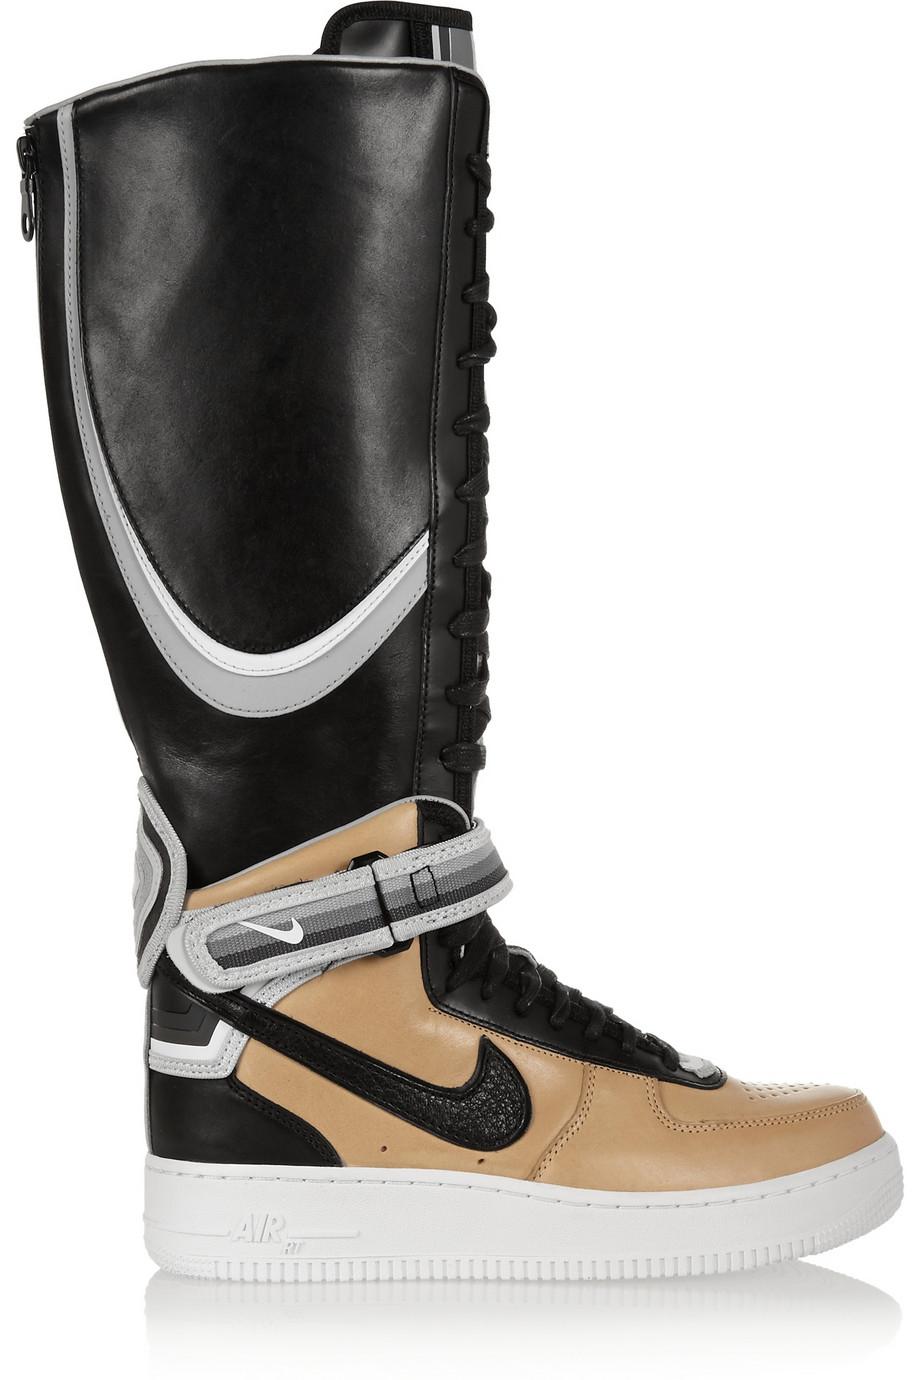 Nike Riccardo Tisci Air Force 1 Leather High Top